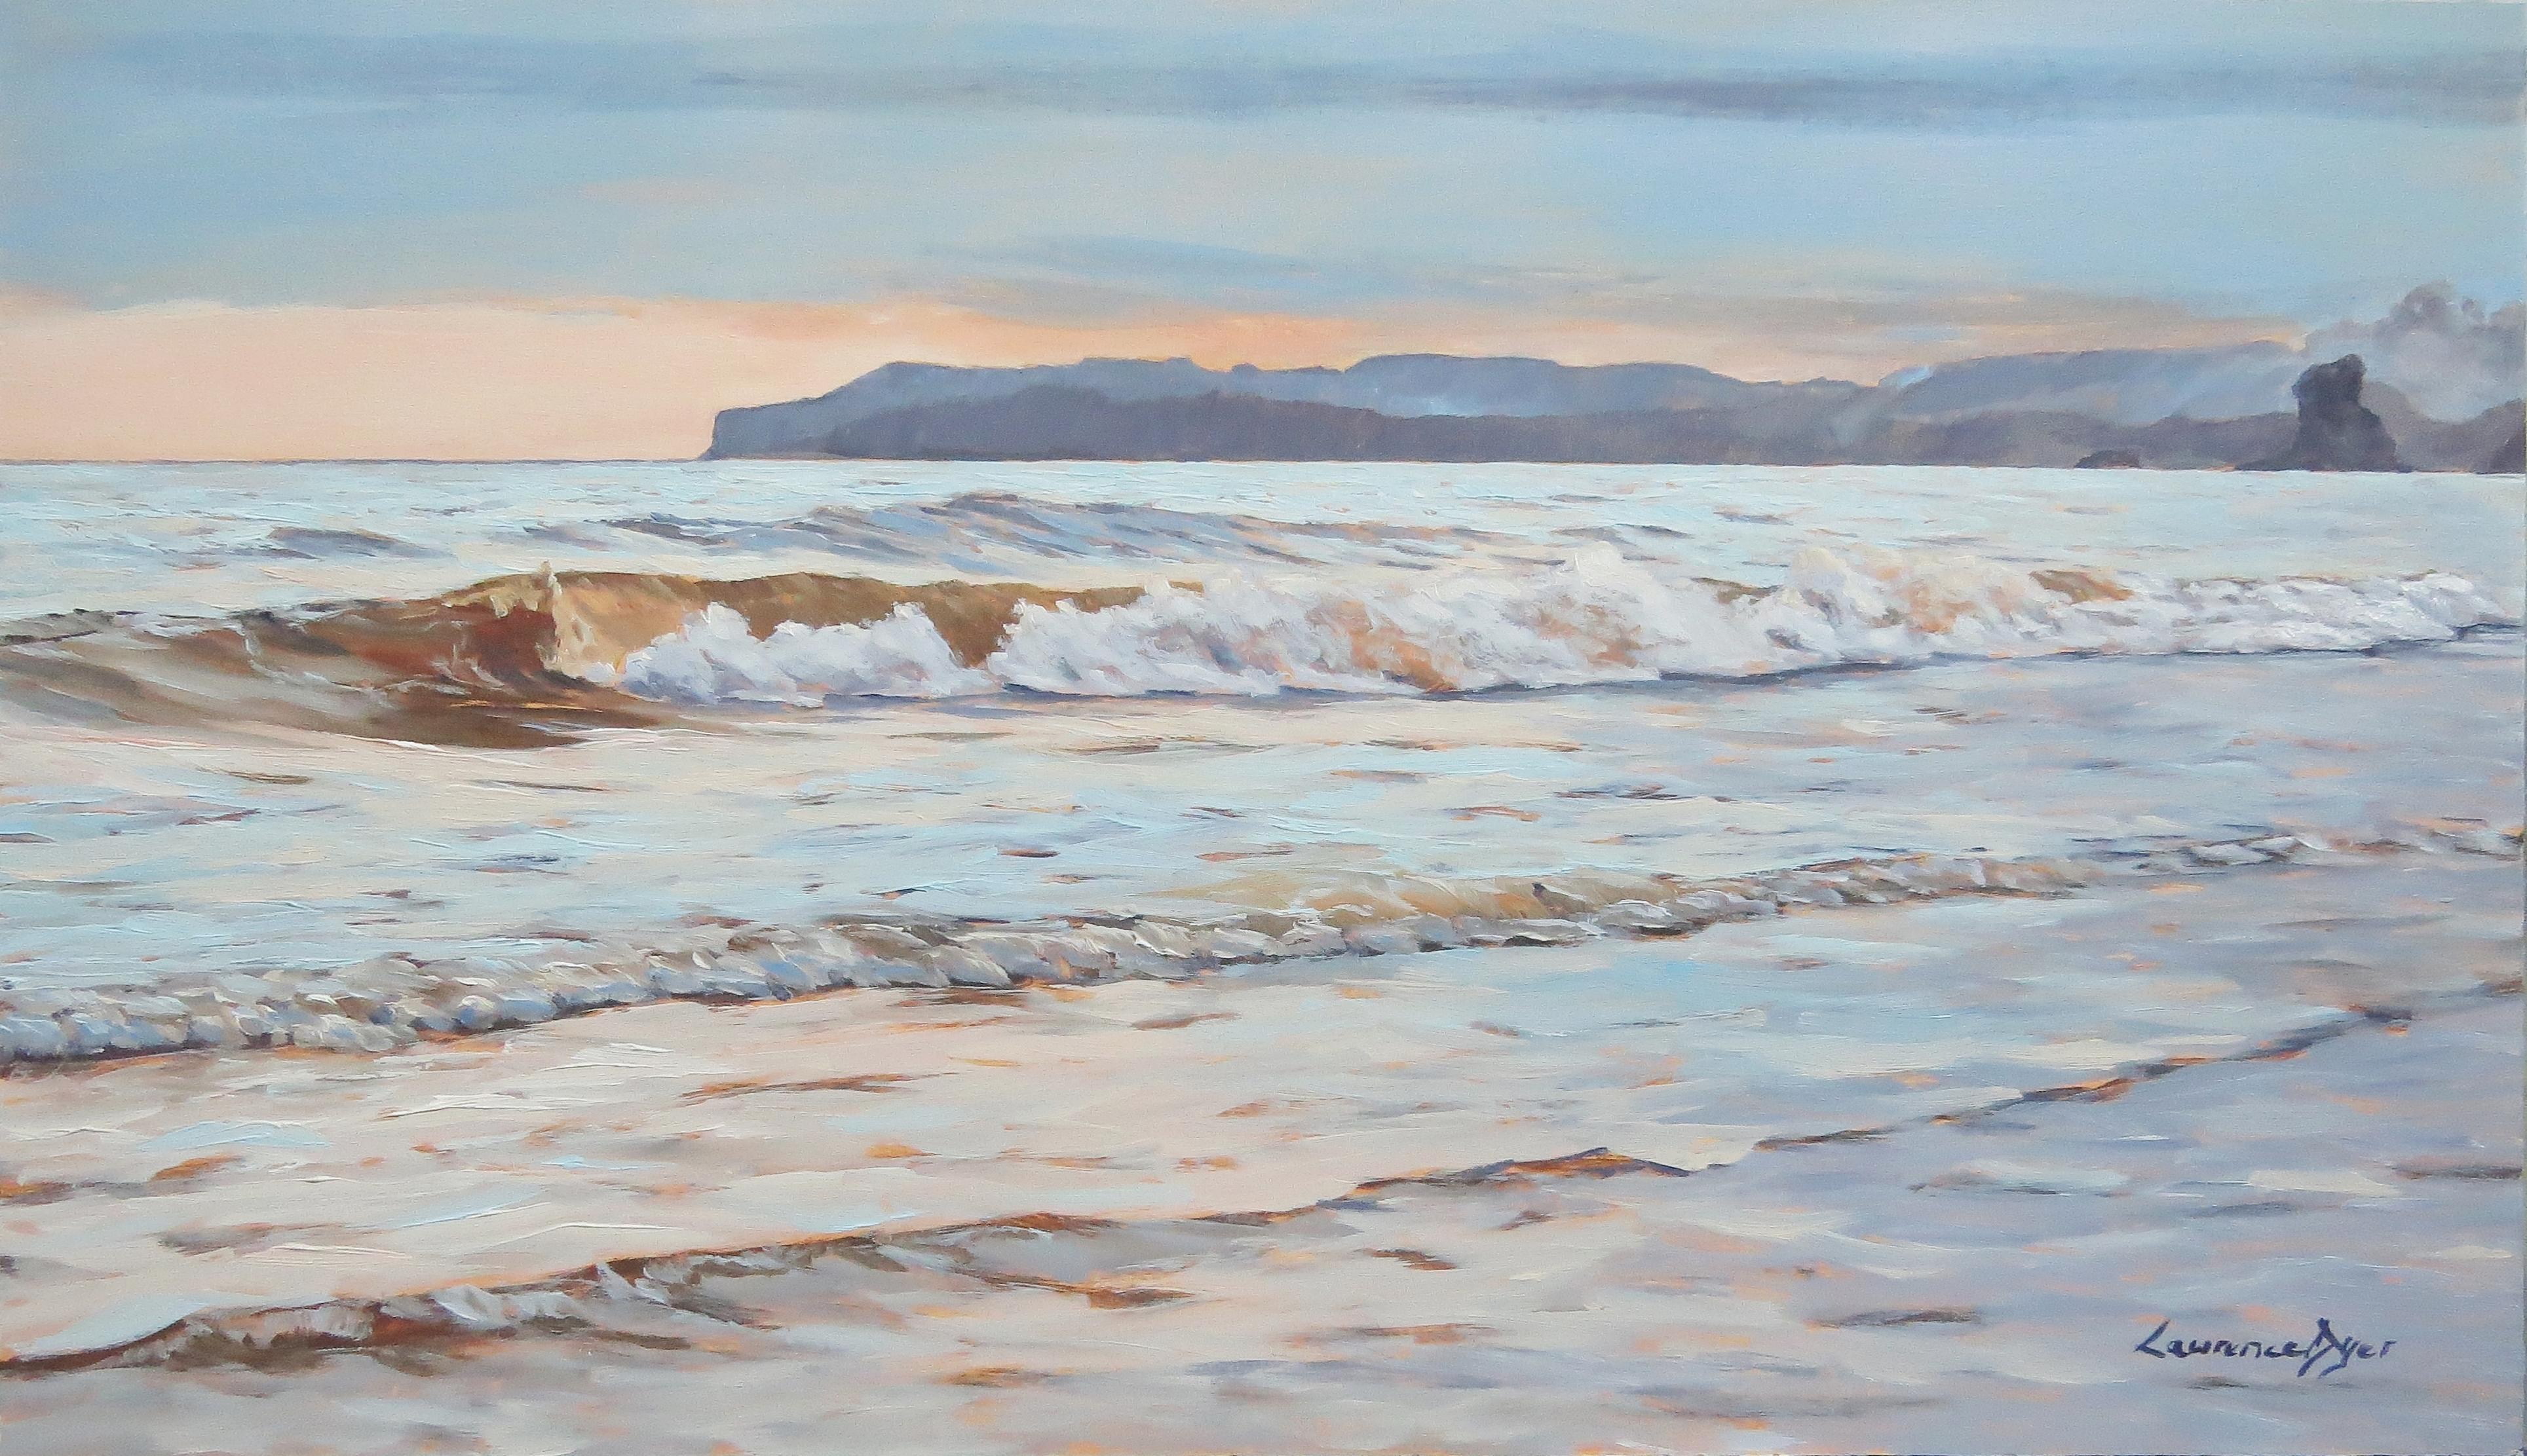 SidmouthWavesWestward-by-Lawrence-Dyer-co-uk-oils-LDSWW2015